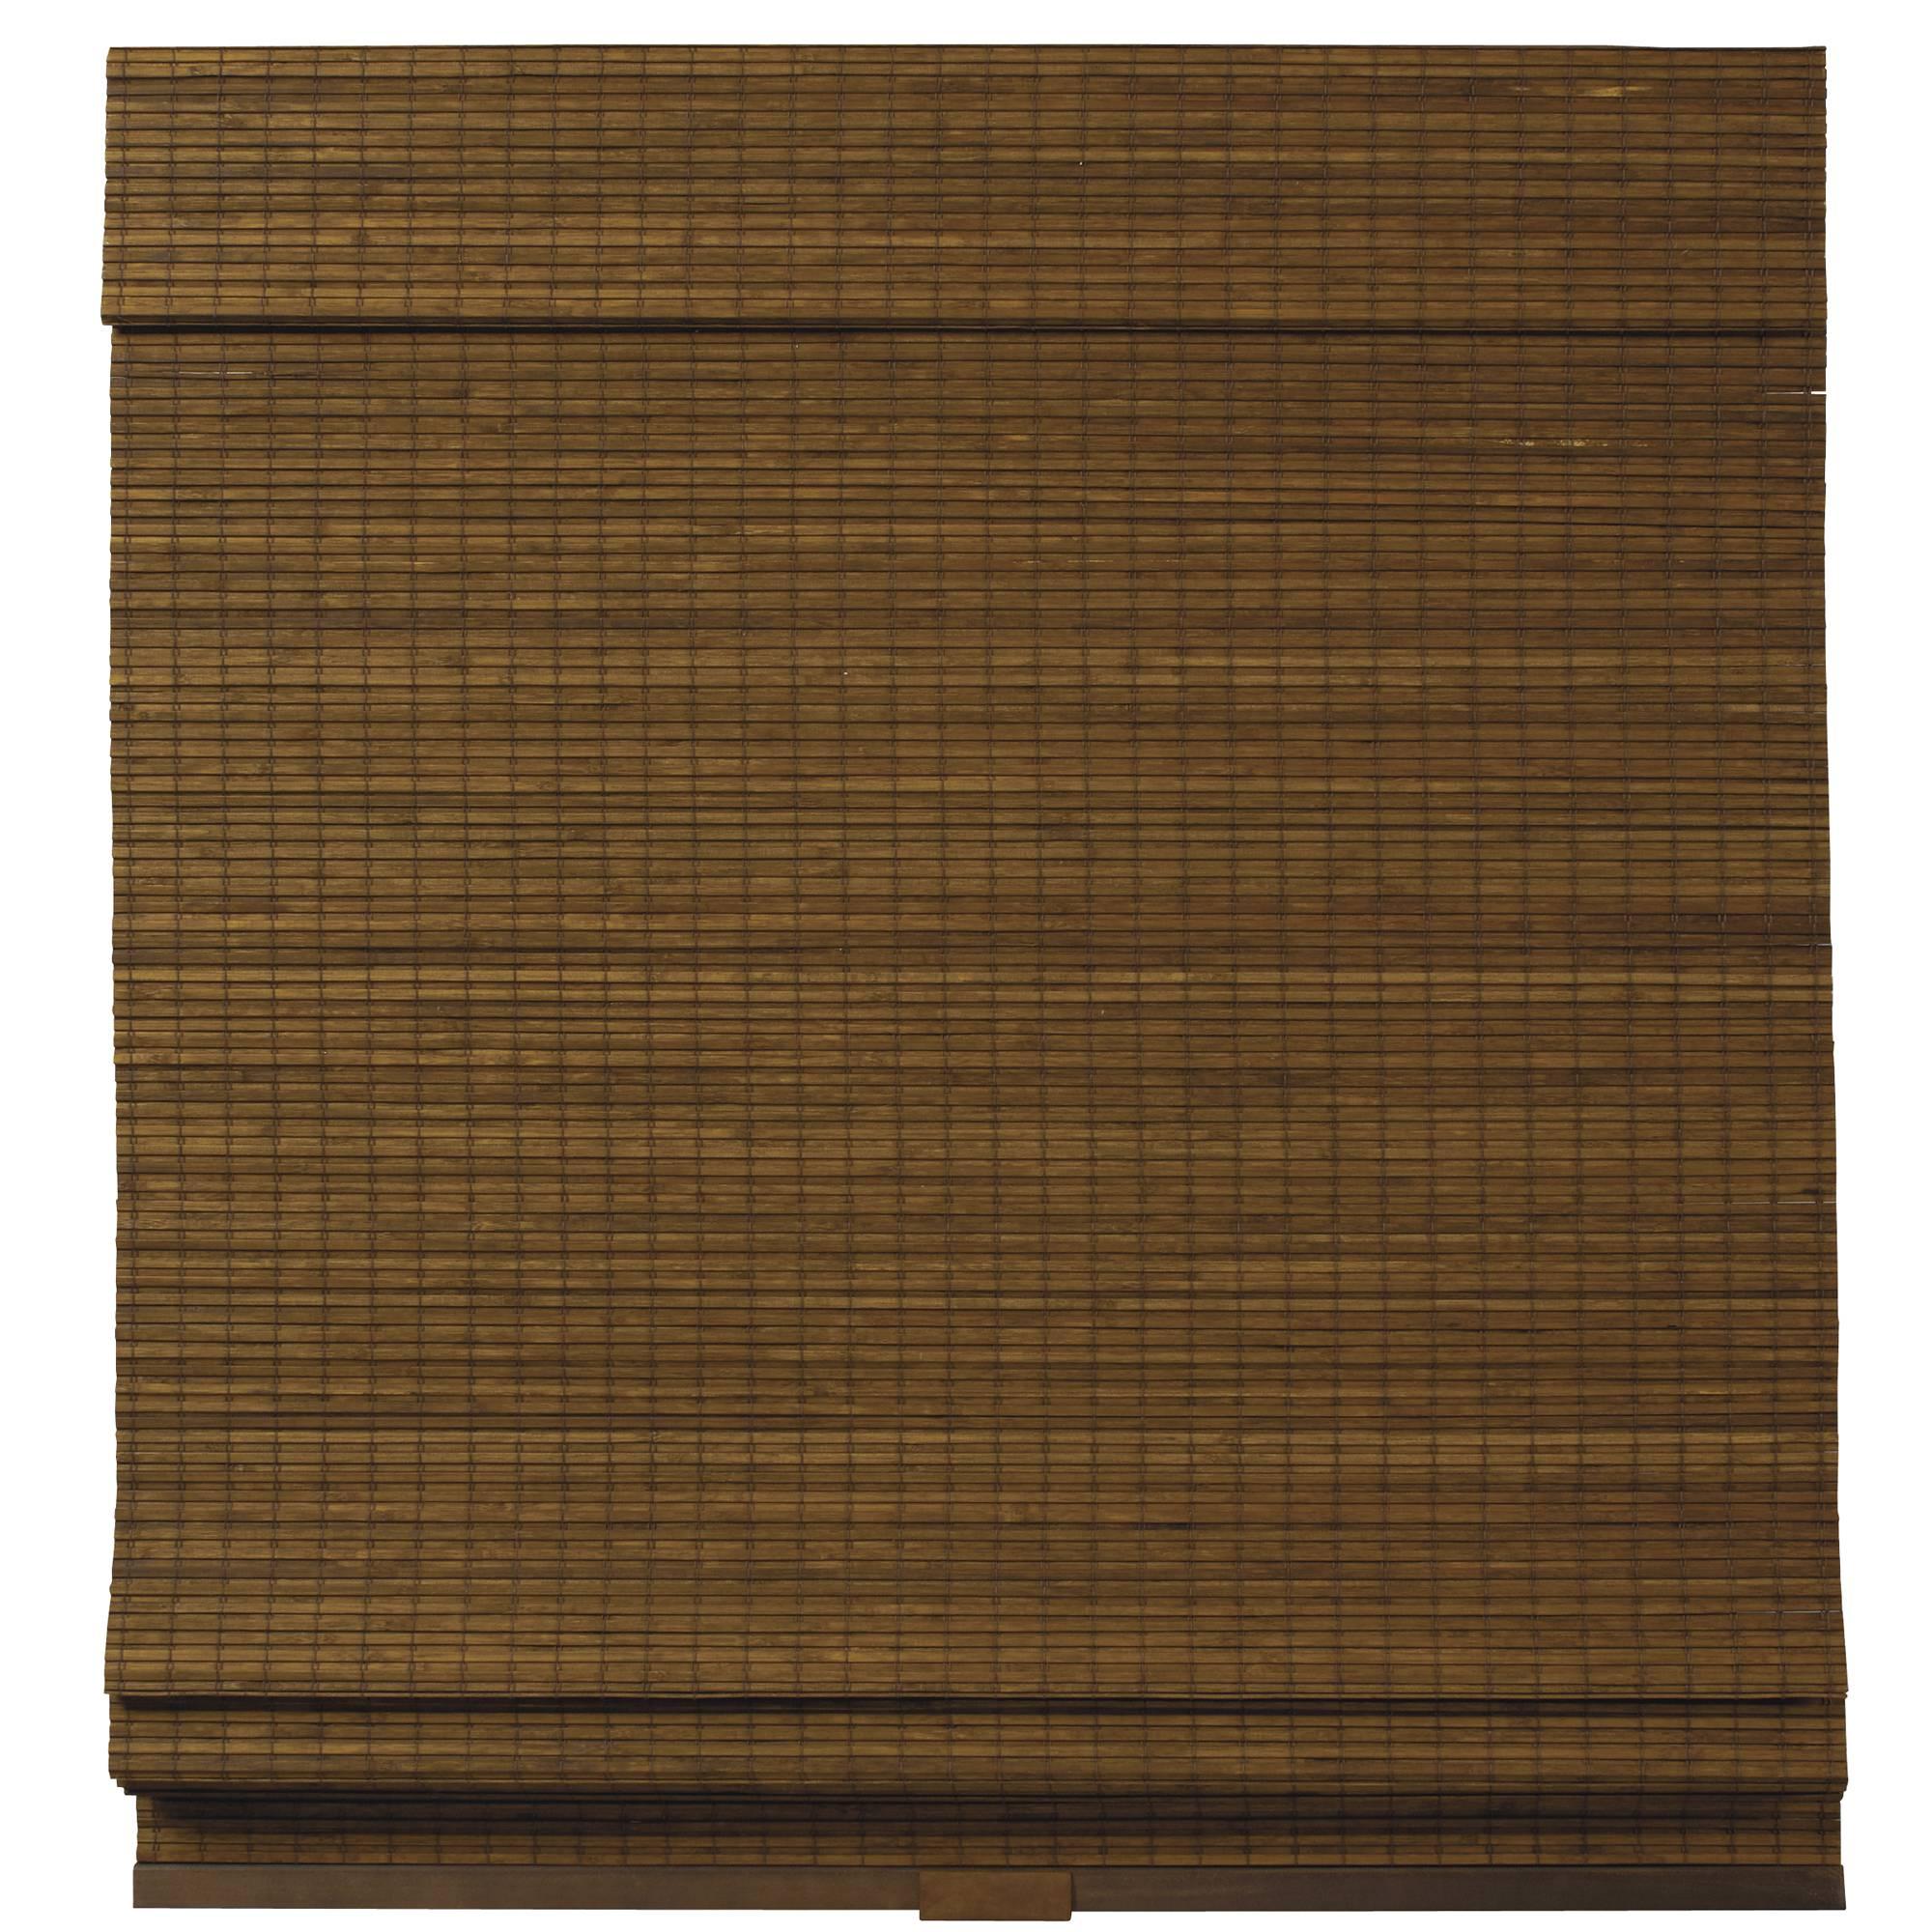 "Brown Cordless Zig-Zag Bamboo Roman Shades 46"" W x 64"" L"